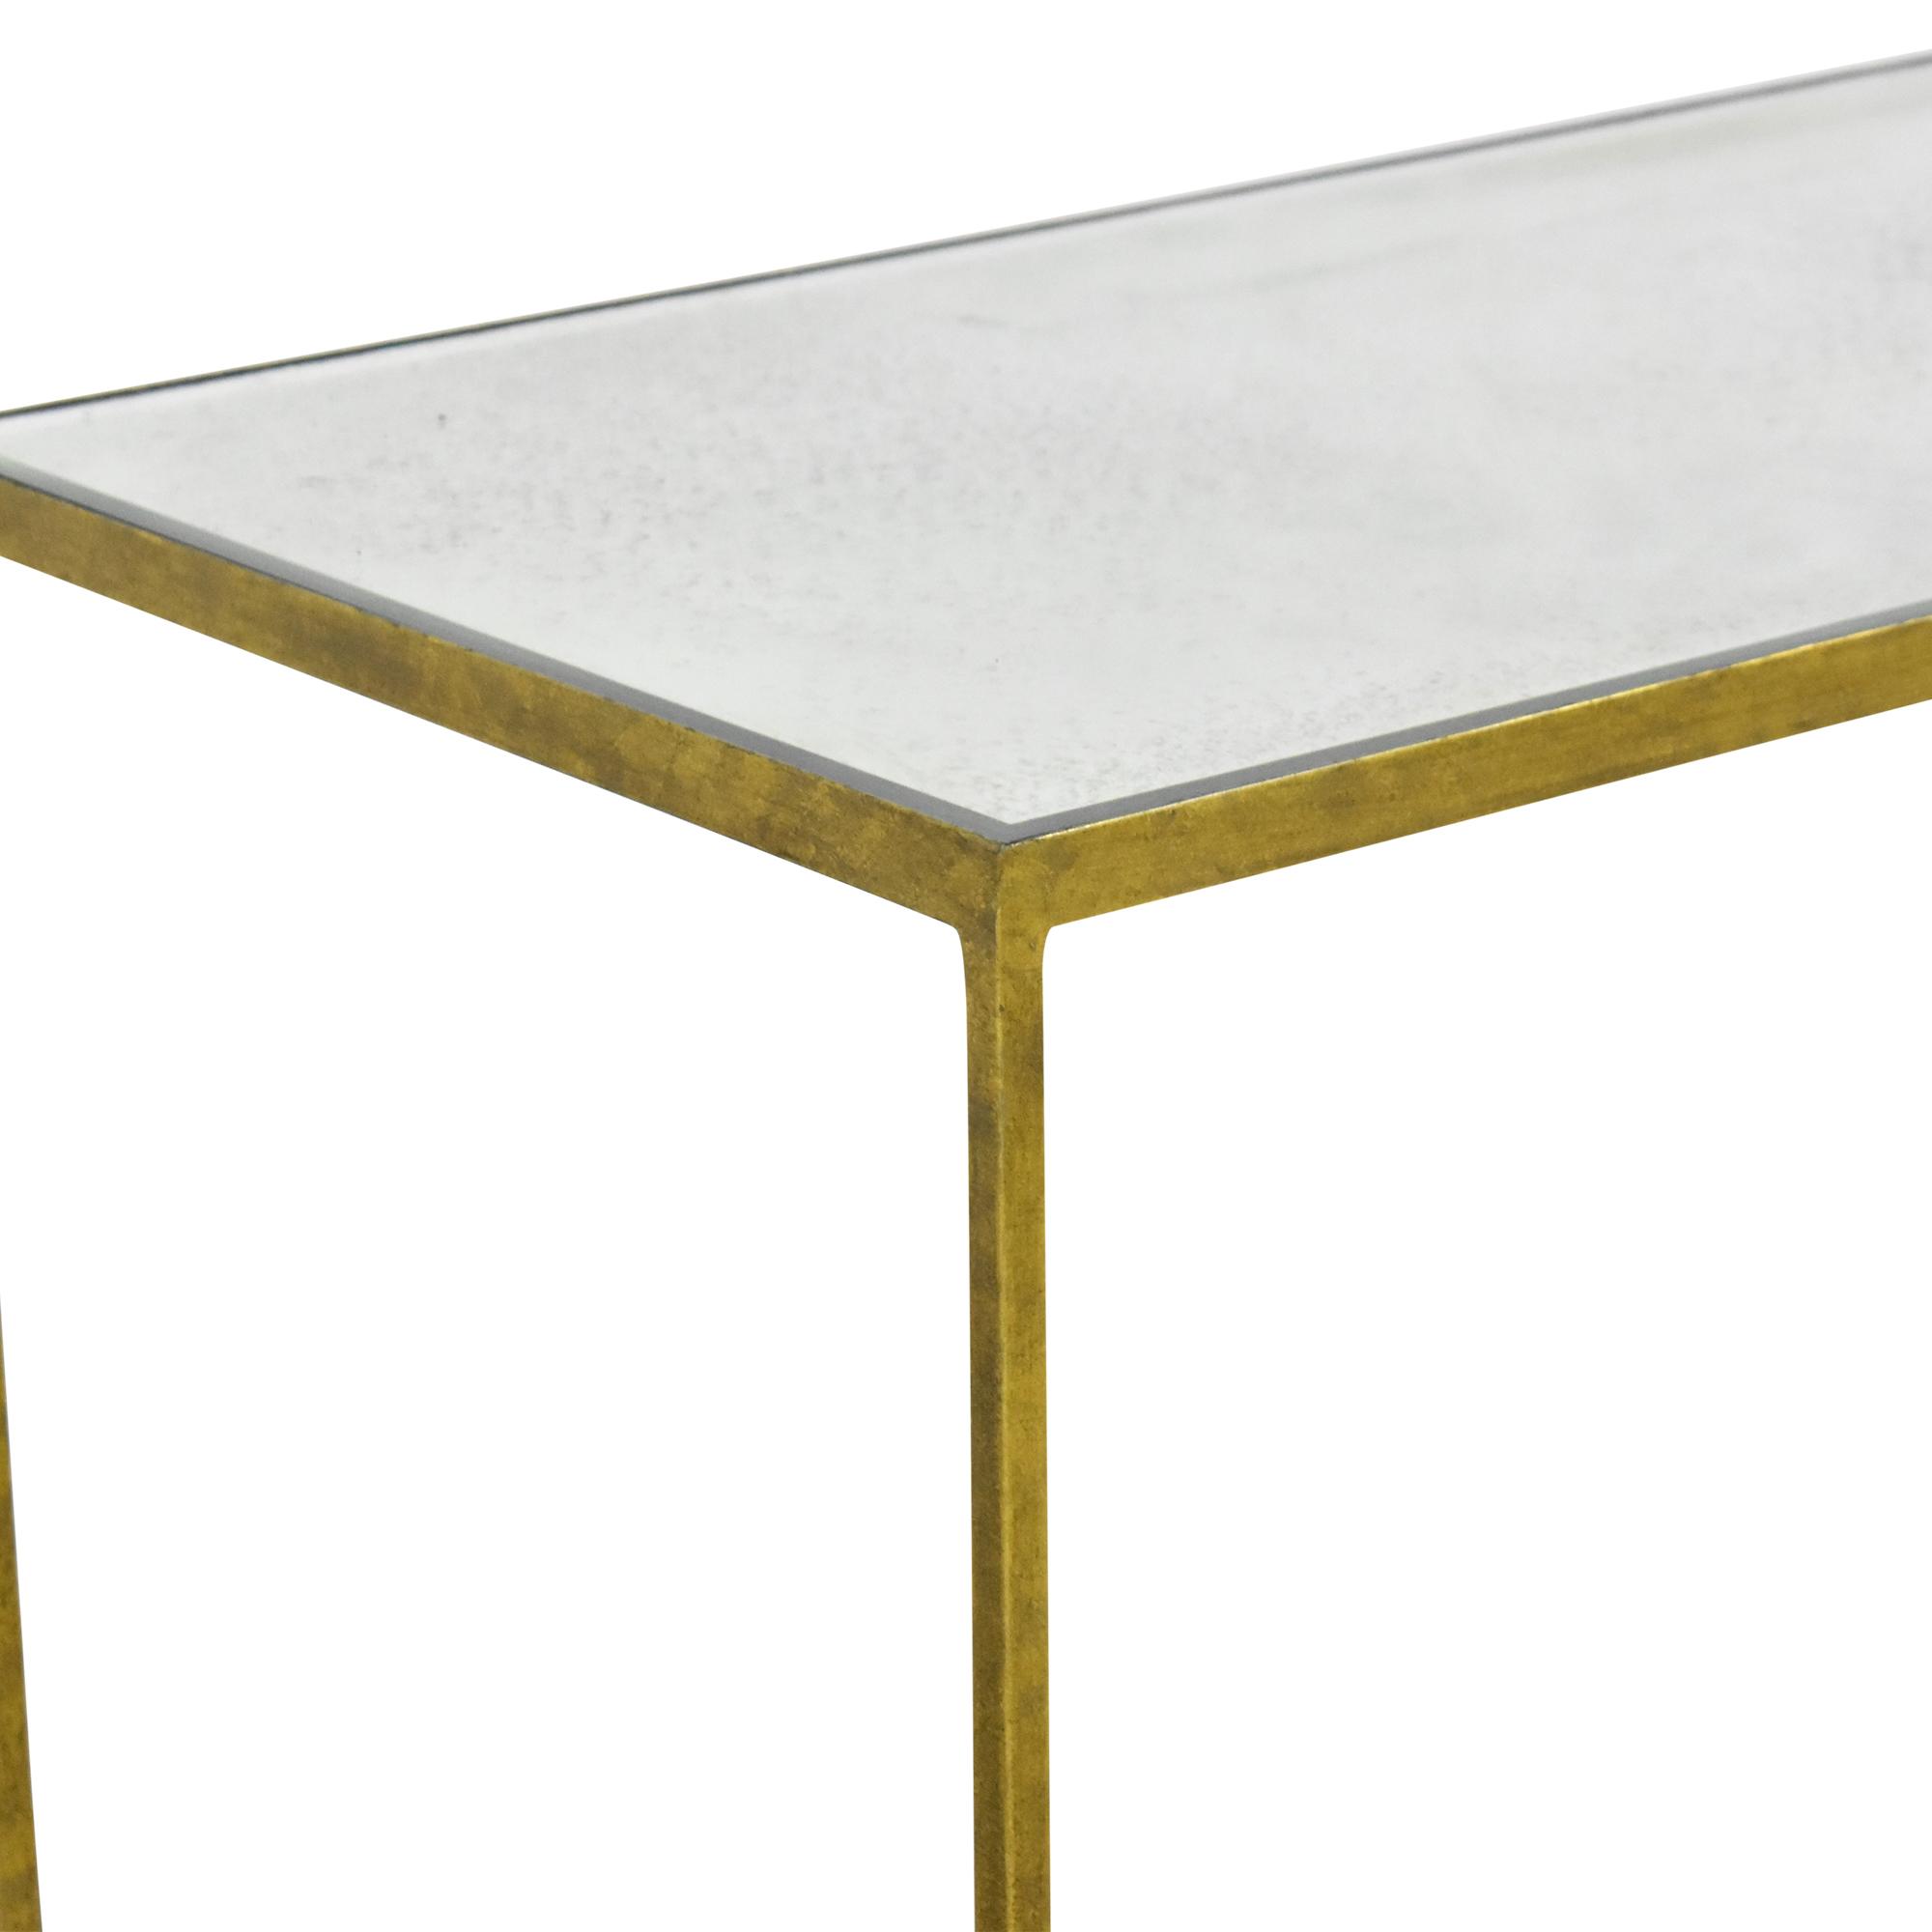 Oly Studio Oly Studio Jonathan Console Table on sale